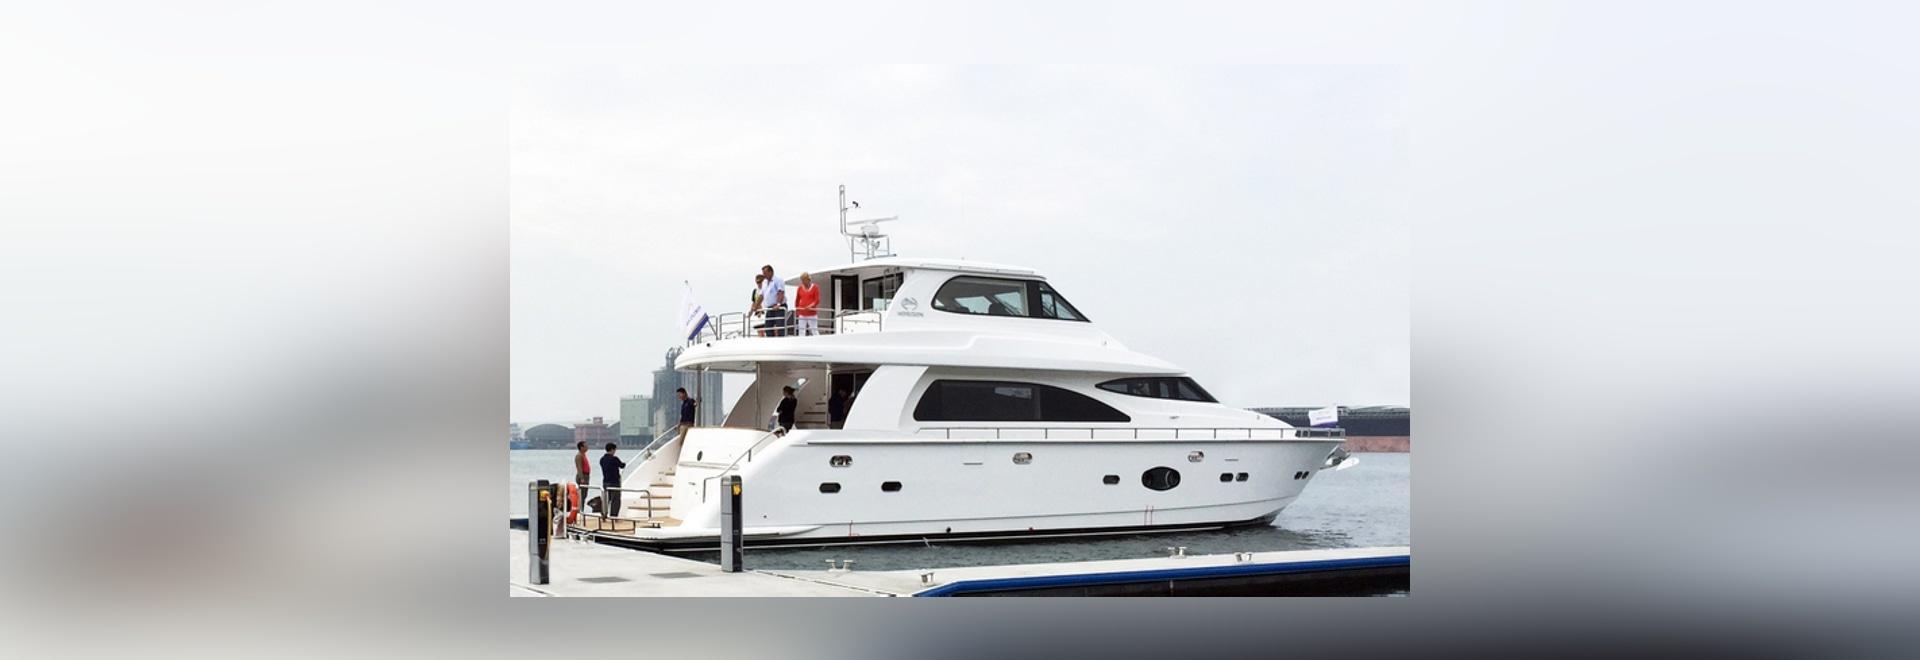 Horizon E73 Yacht JUSTUS under sea trials